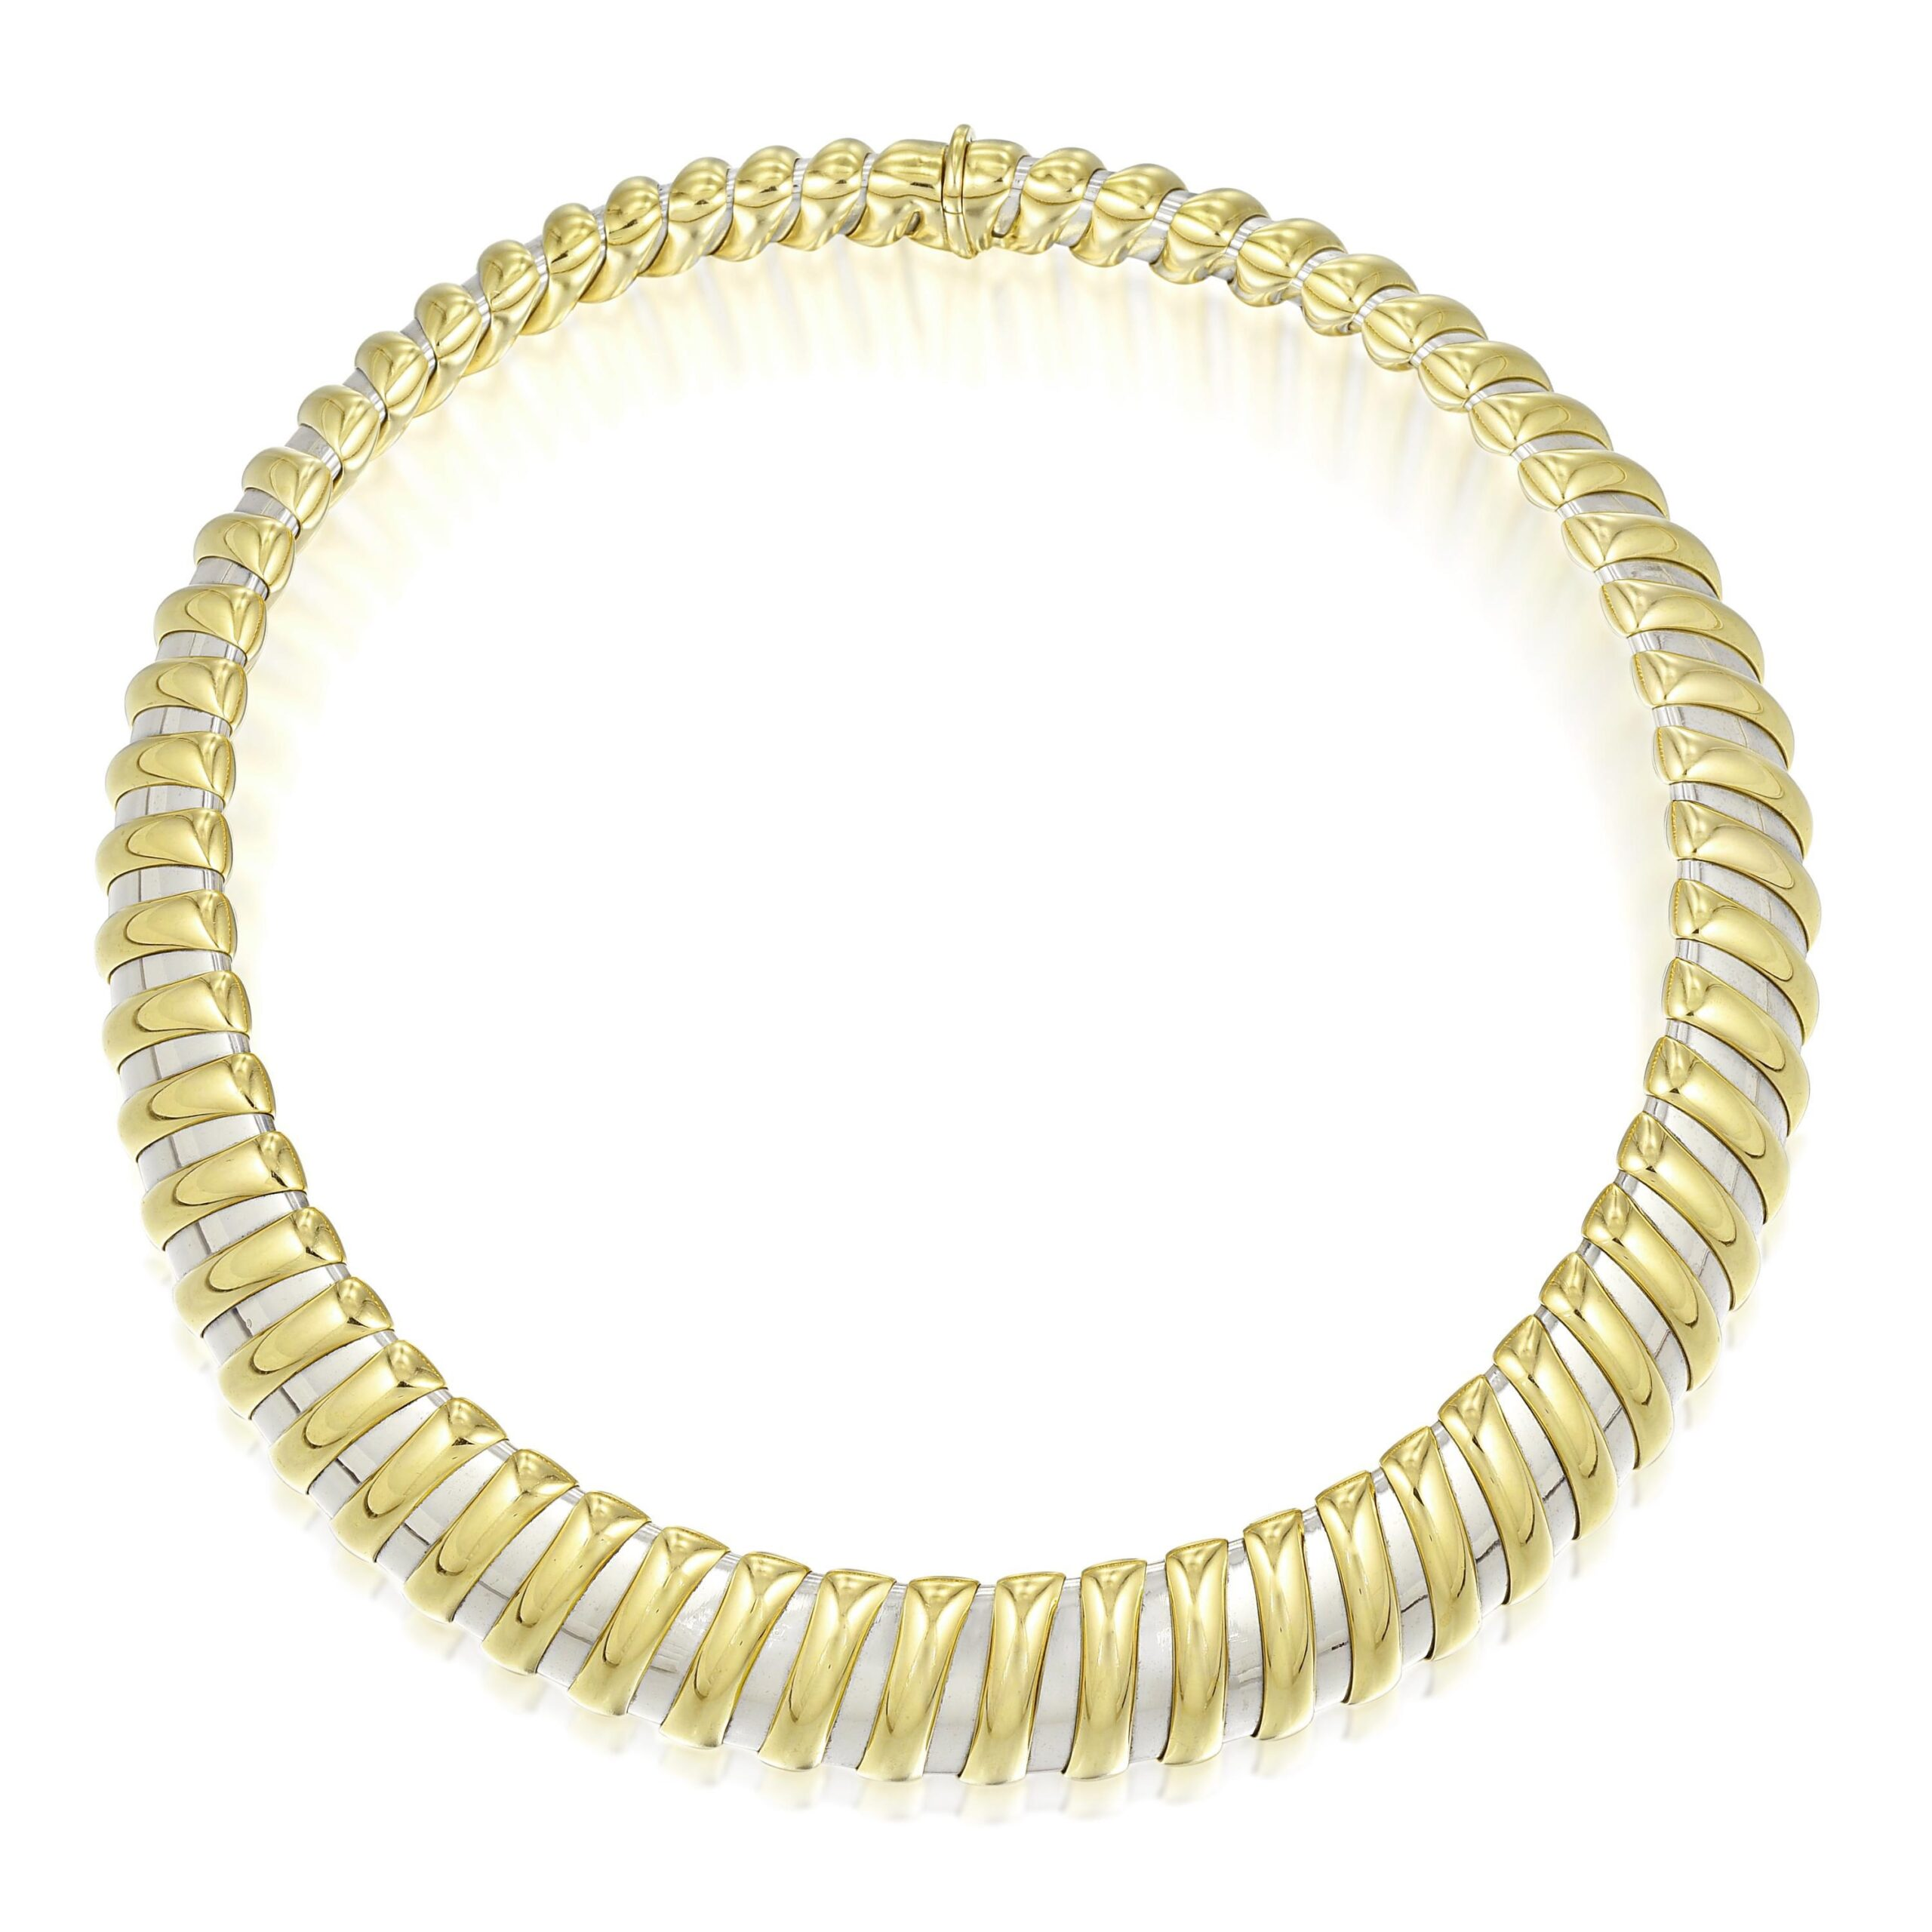 Bulgari Vintage Necklace